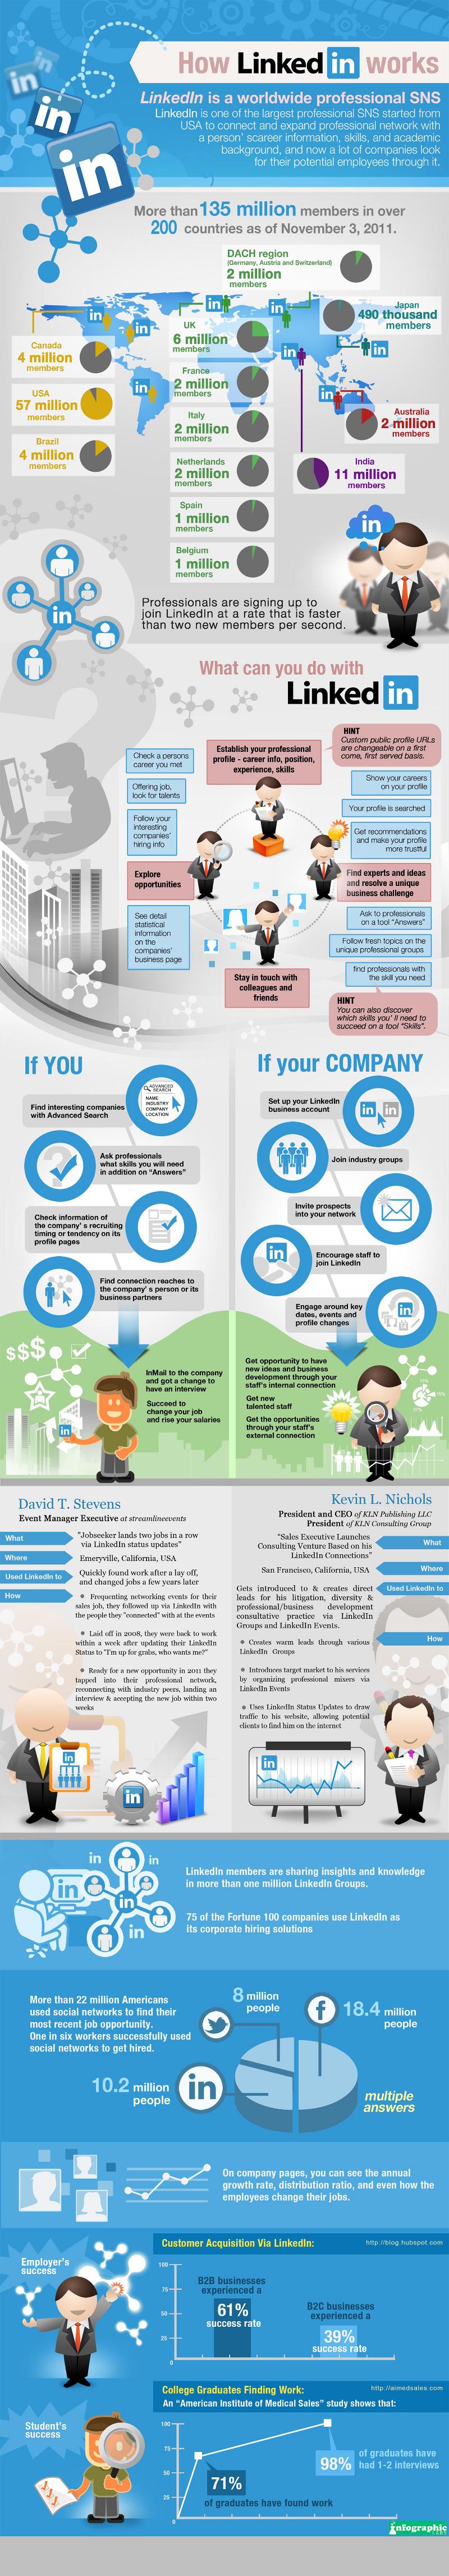 17 LinkedIn Company and Business Profile Tips